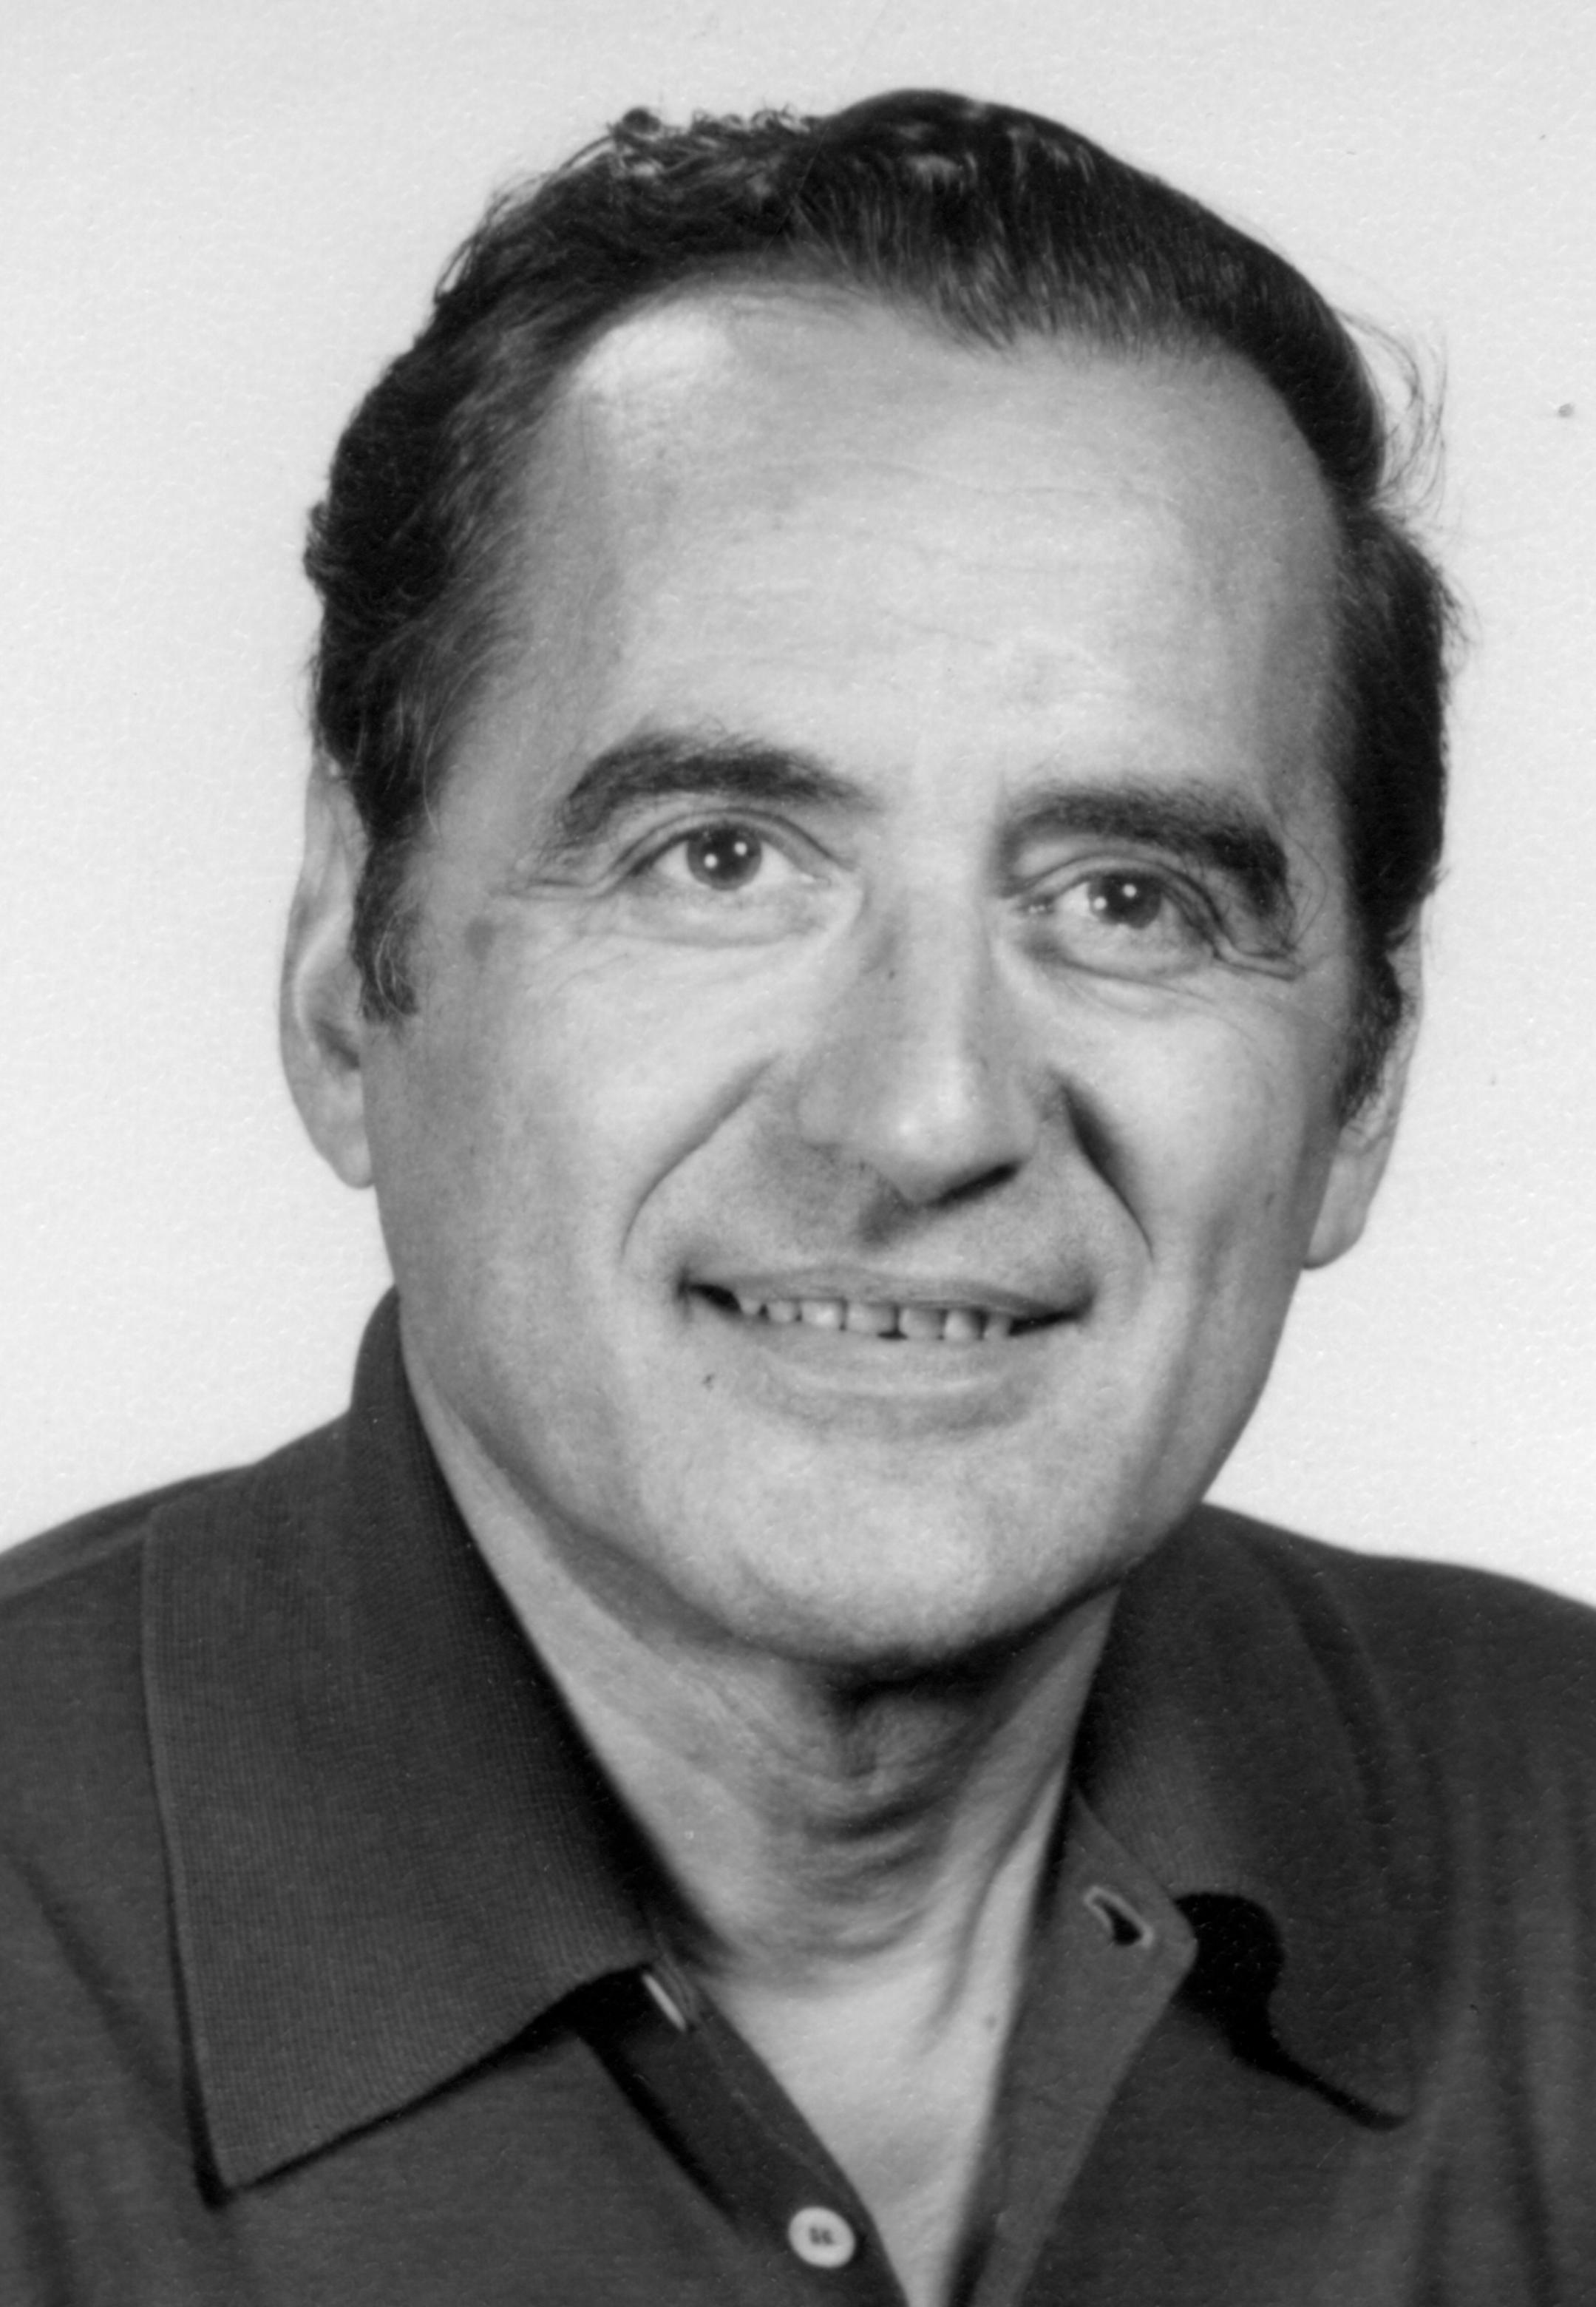 Samuel Mermin